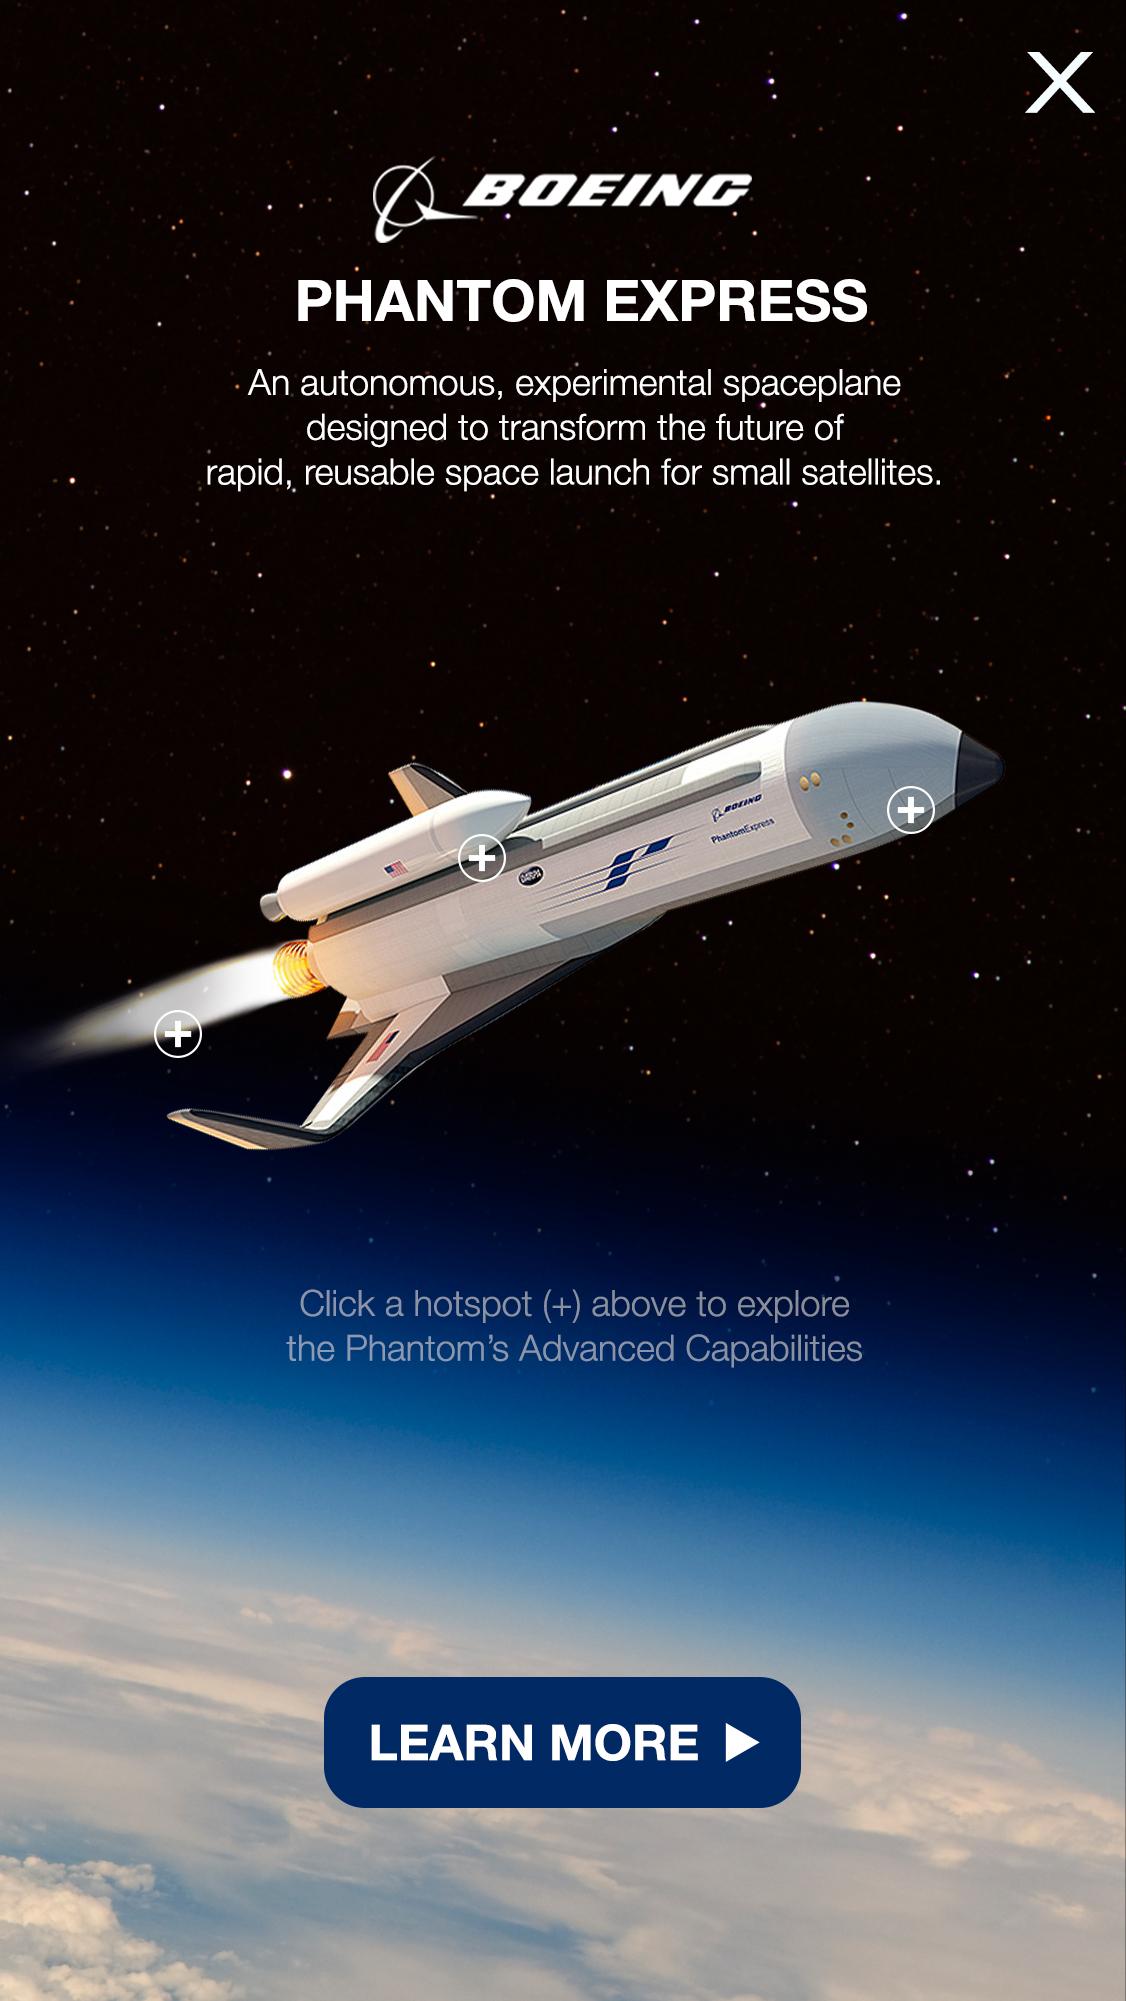 Boeing-APP-IM_0002_3